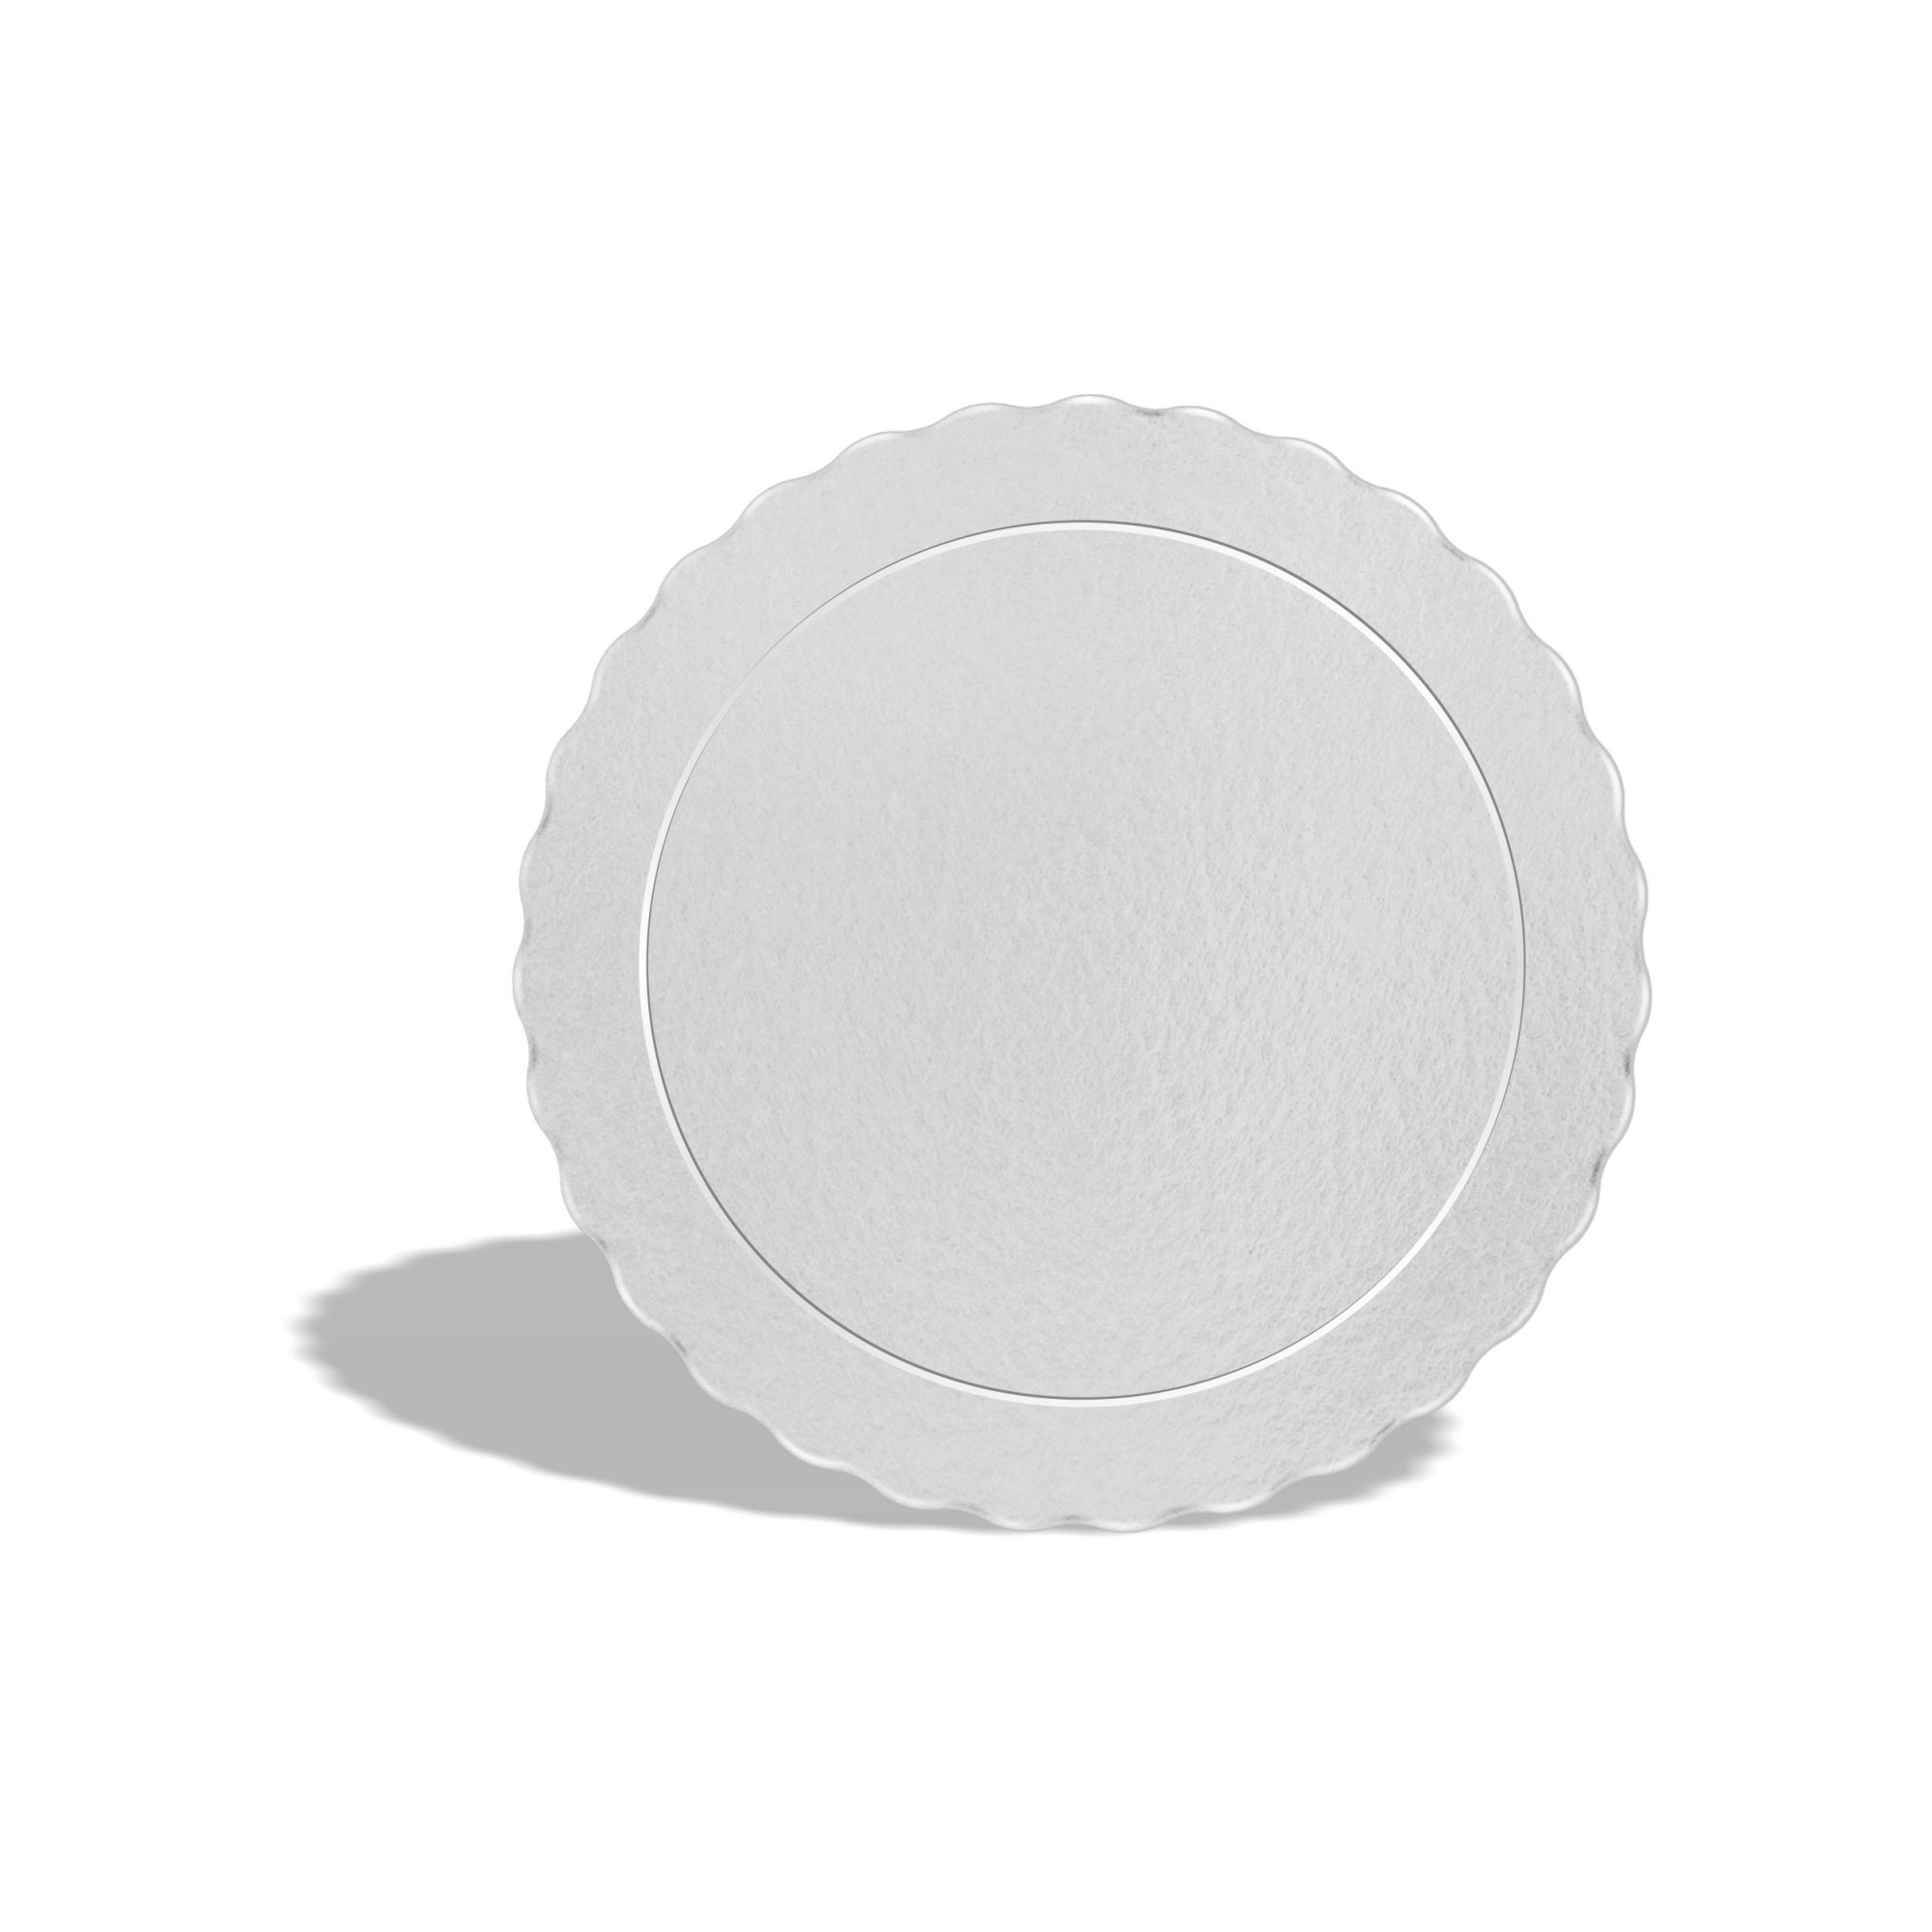 50 Bases Laminadas, Suporte P/ Bolo, Cake Board, 23cm - Branco